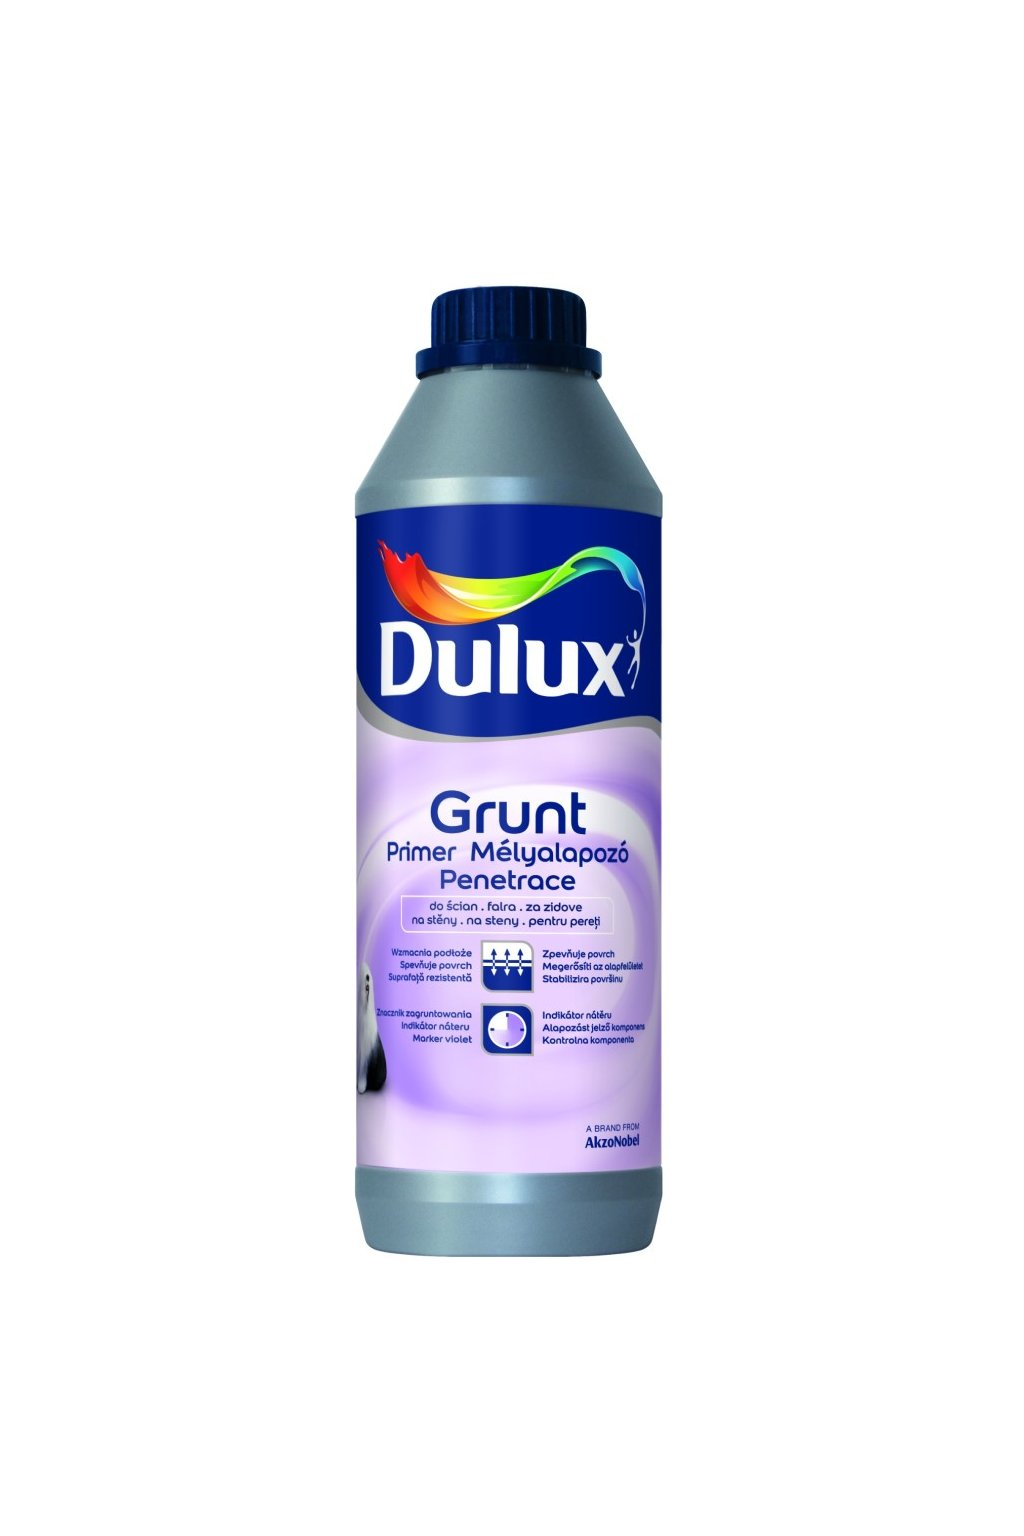 Dulux Grunt 1L new